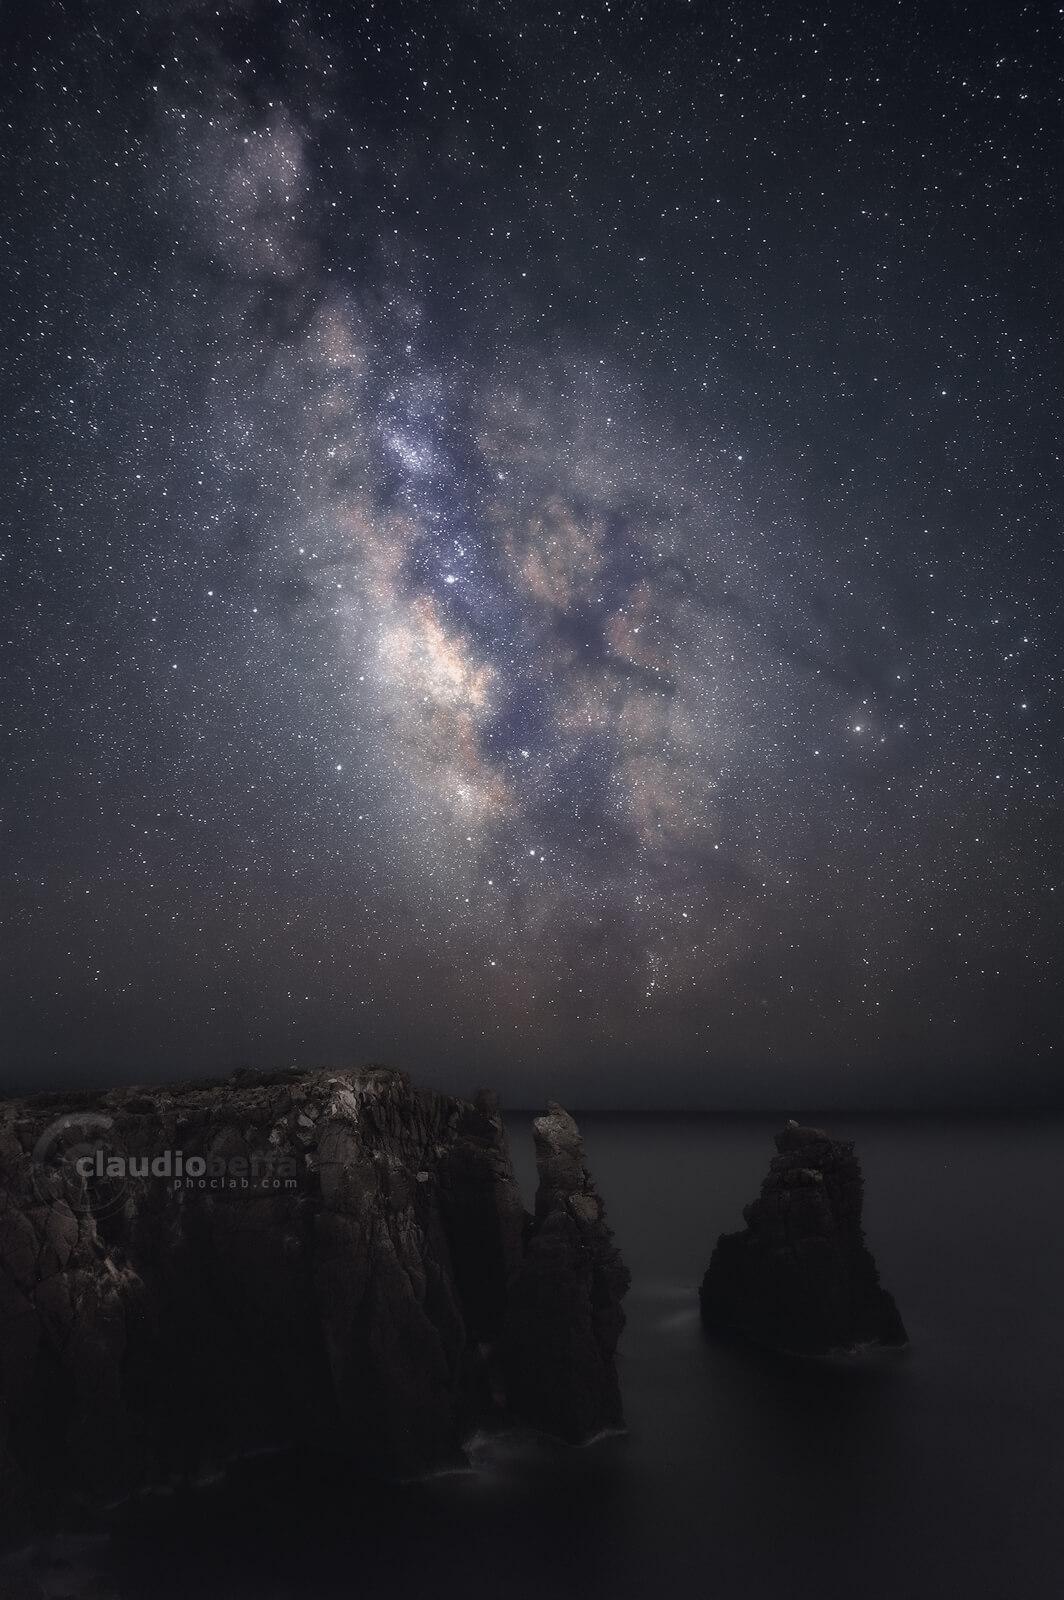 Milky Way, core, stars, Jupiter, night, rocks, stones, pillars, sea, astrophotography, nightphotography, sardinia, italy, landscape